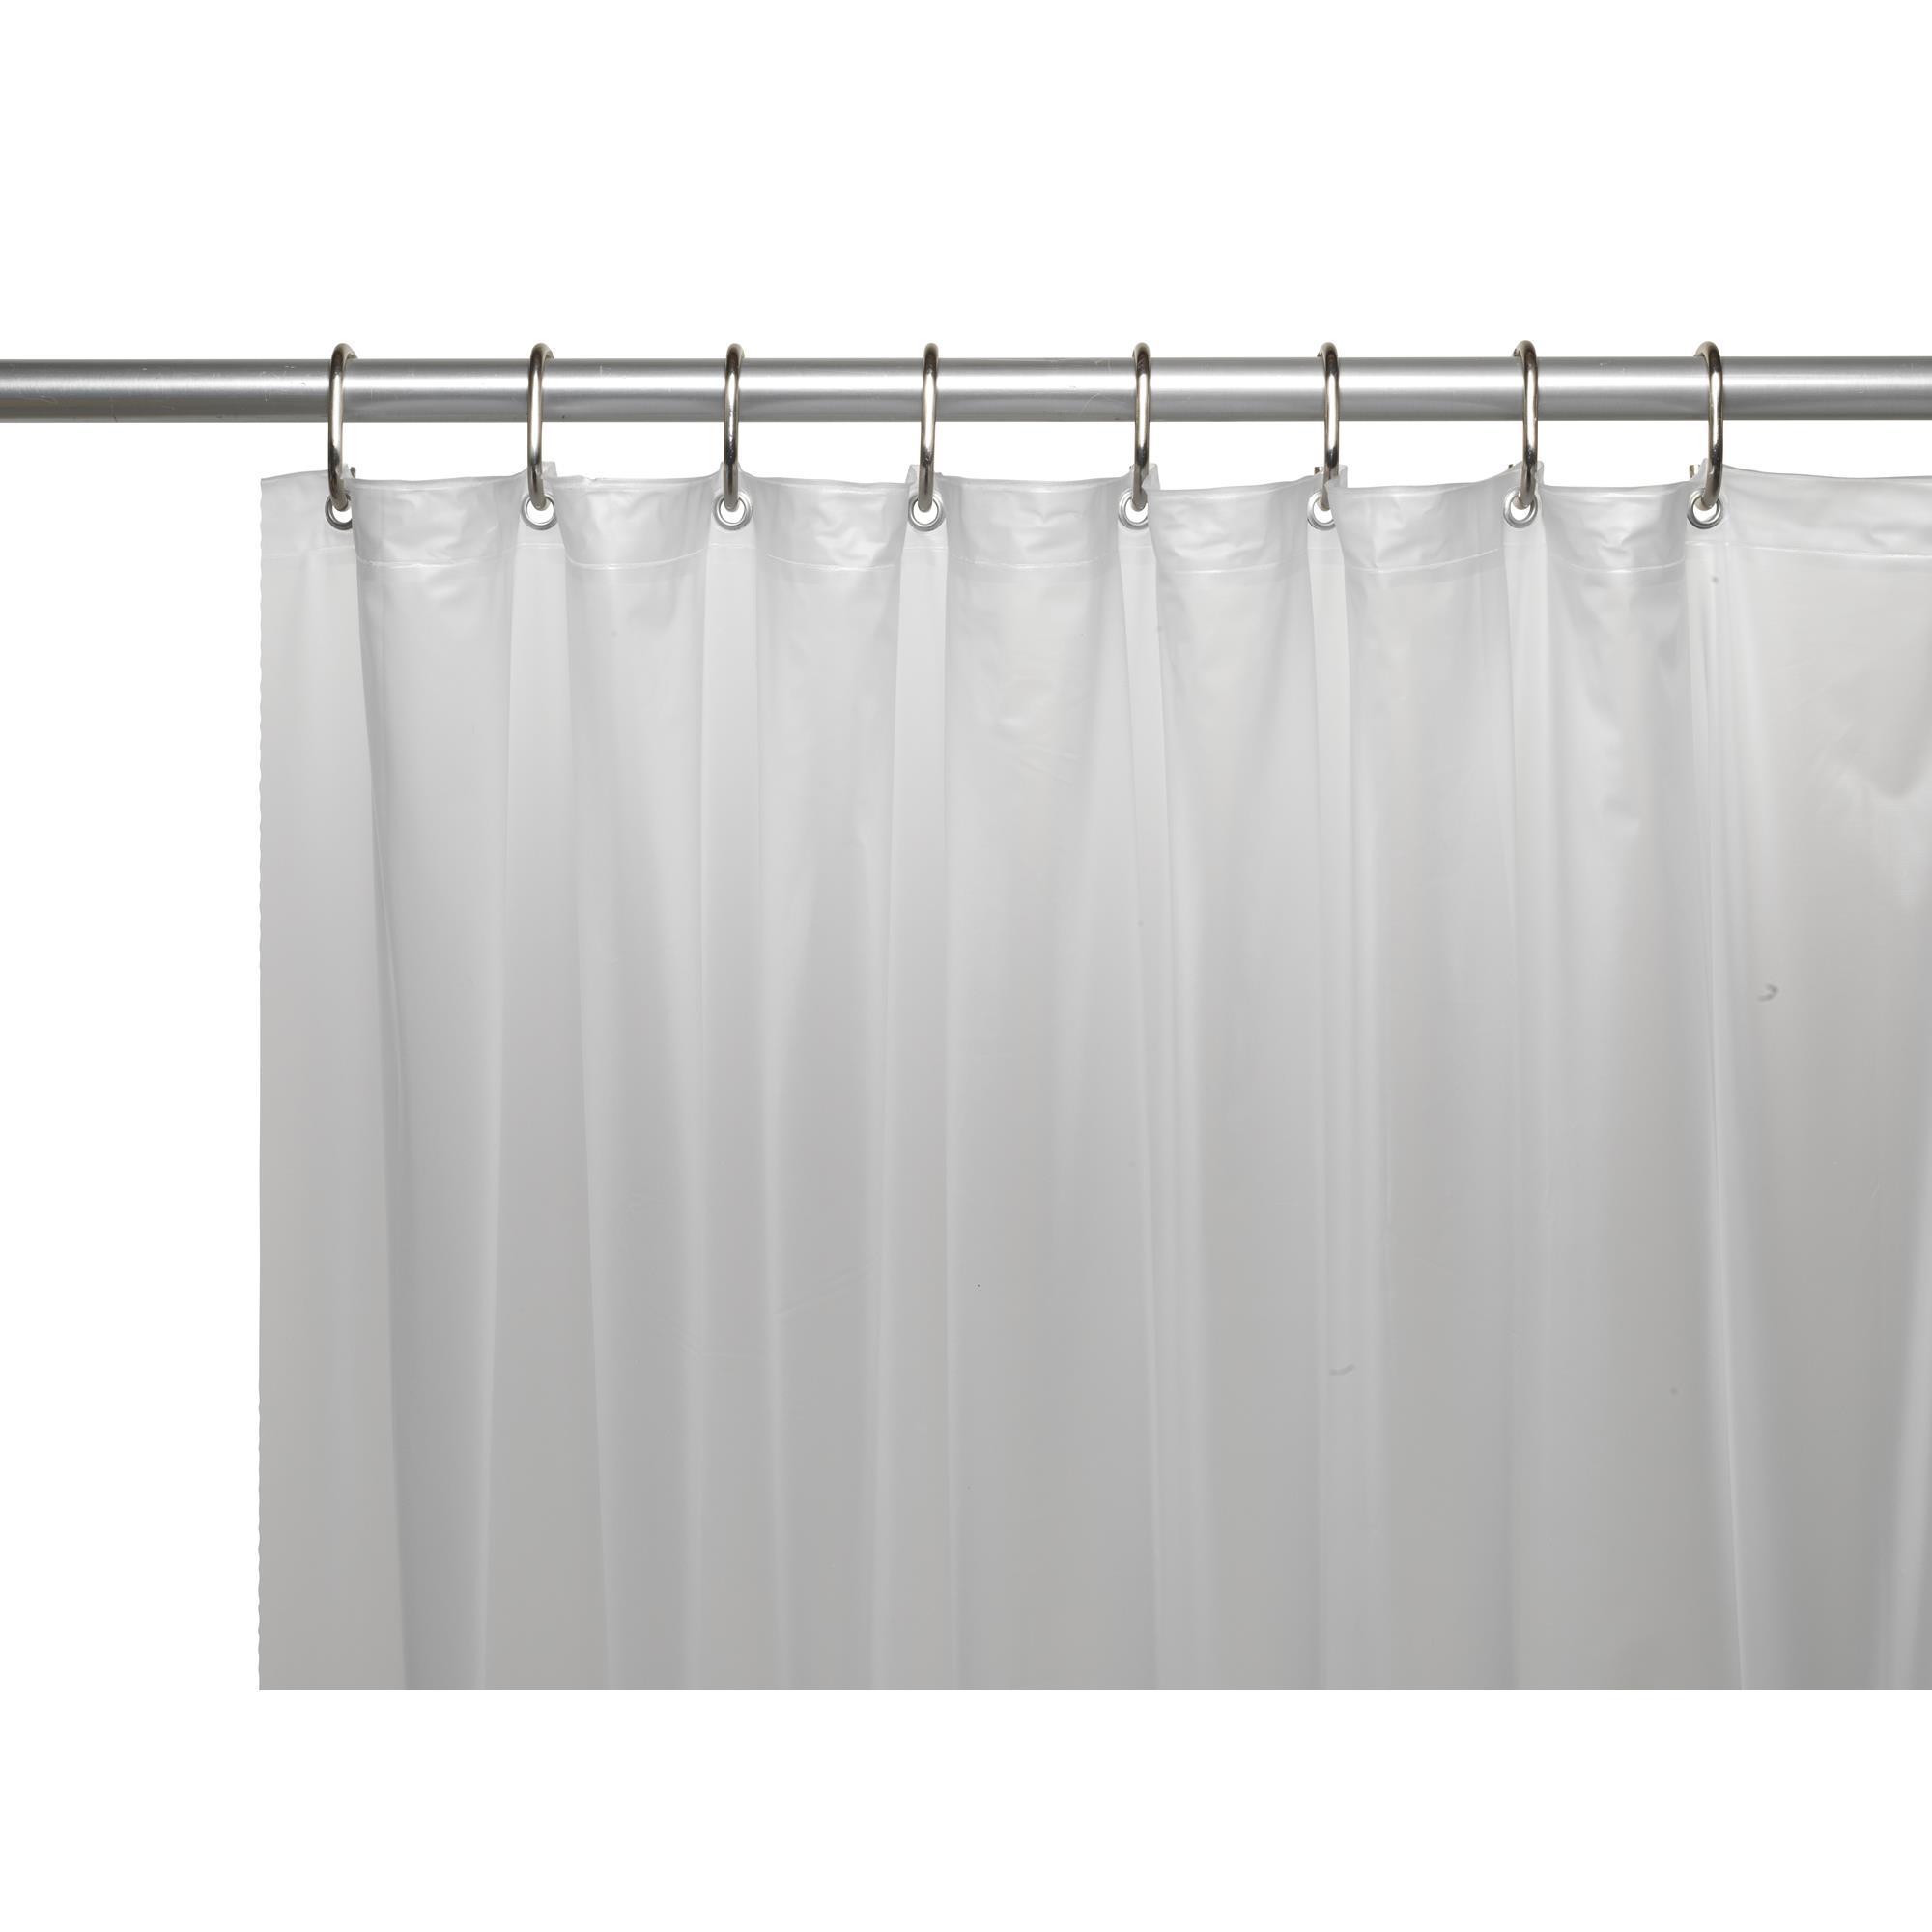 Carnation Mildew Resistant 10 Gauge Vinyl Shower Curtain Liner Slate 72 x 72